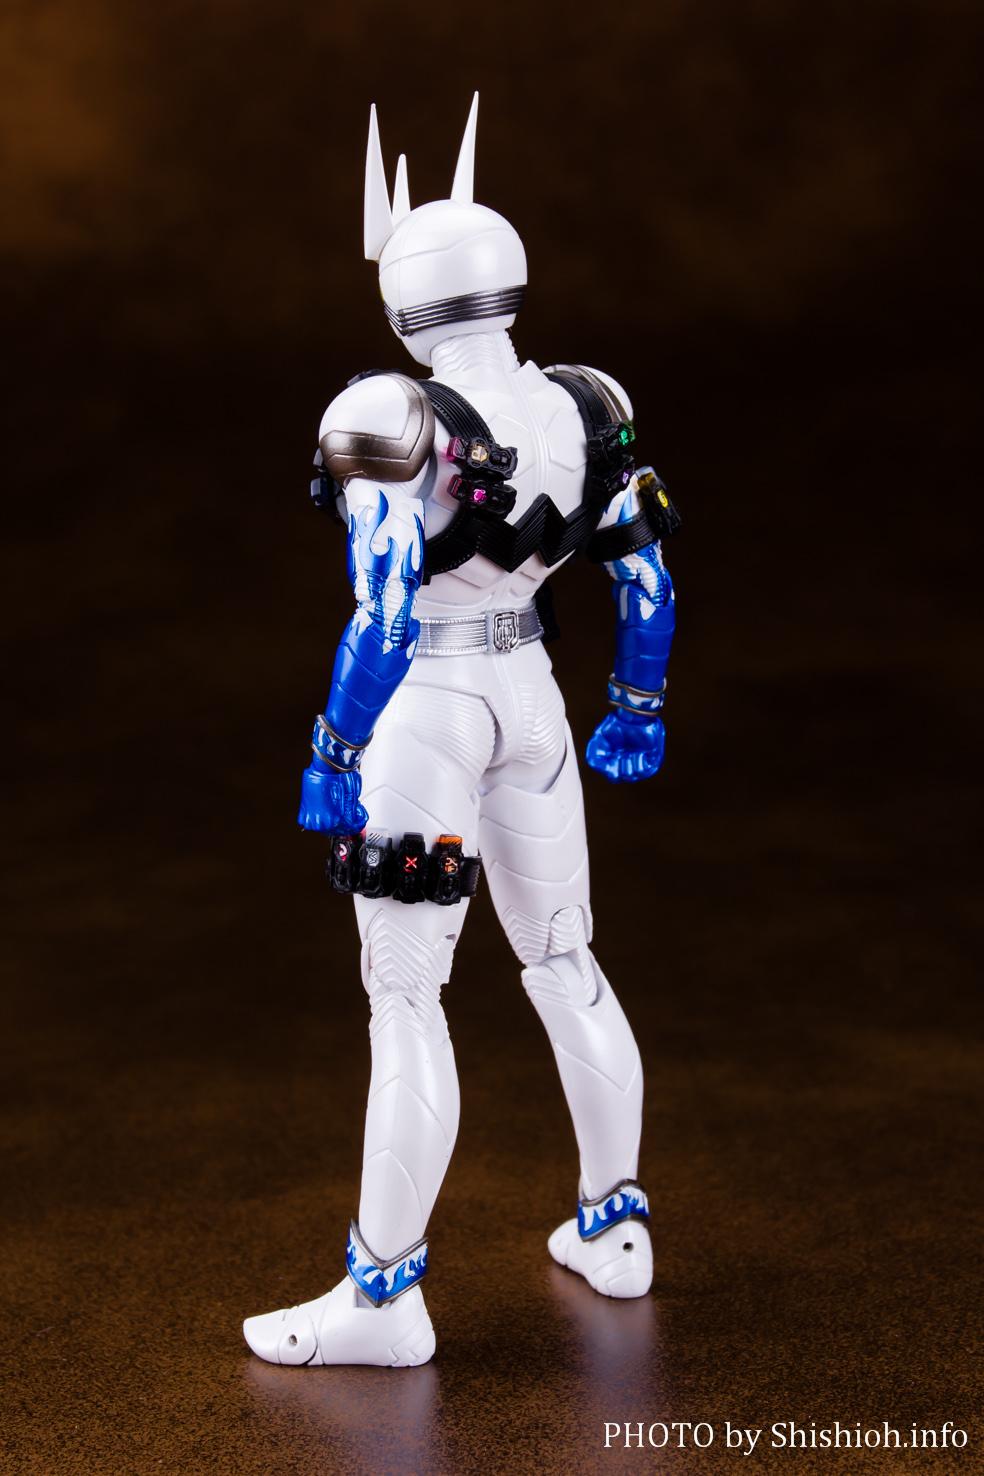 S.H.Figuarts(真骨彫製法) 仮面ライダーエターナル